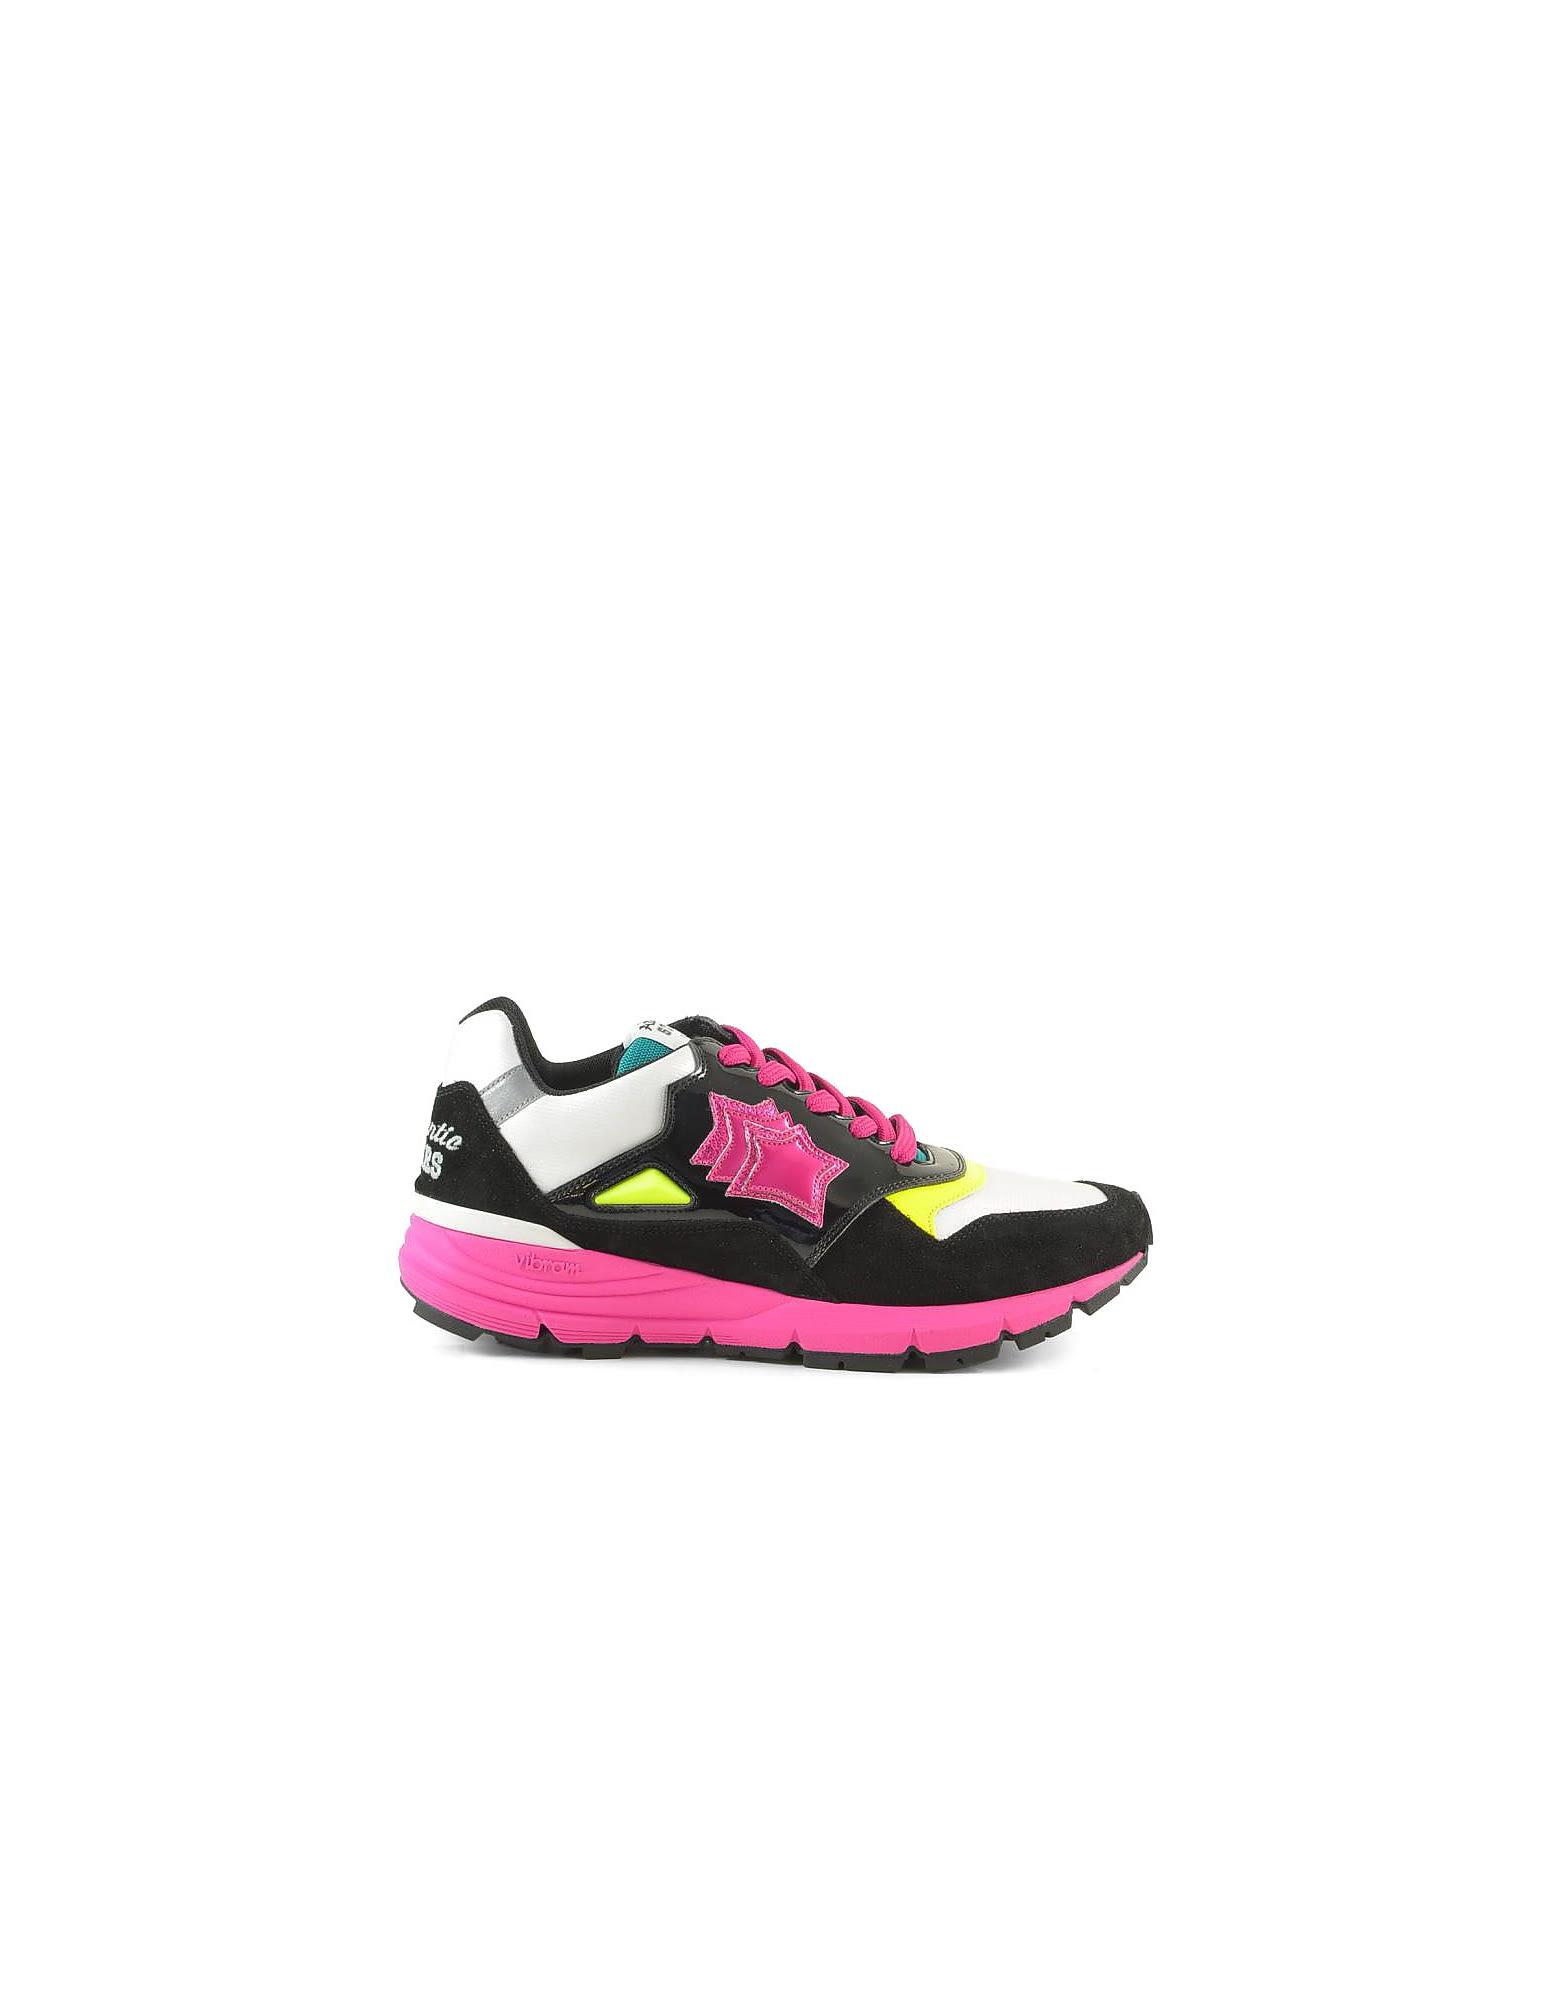 Black Sneakers W/pink Rubber Sole